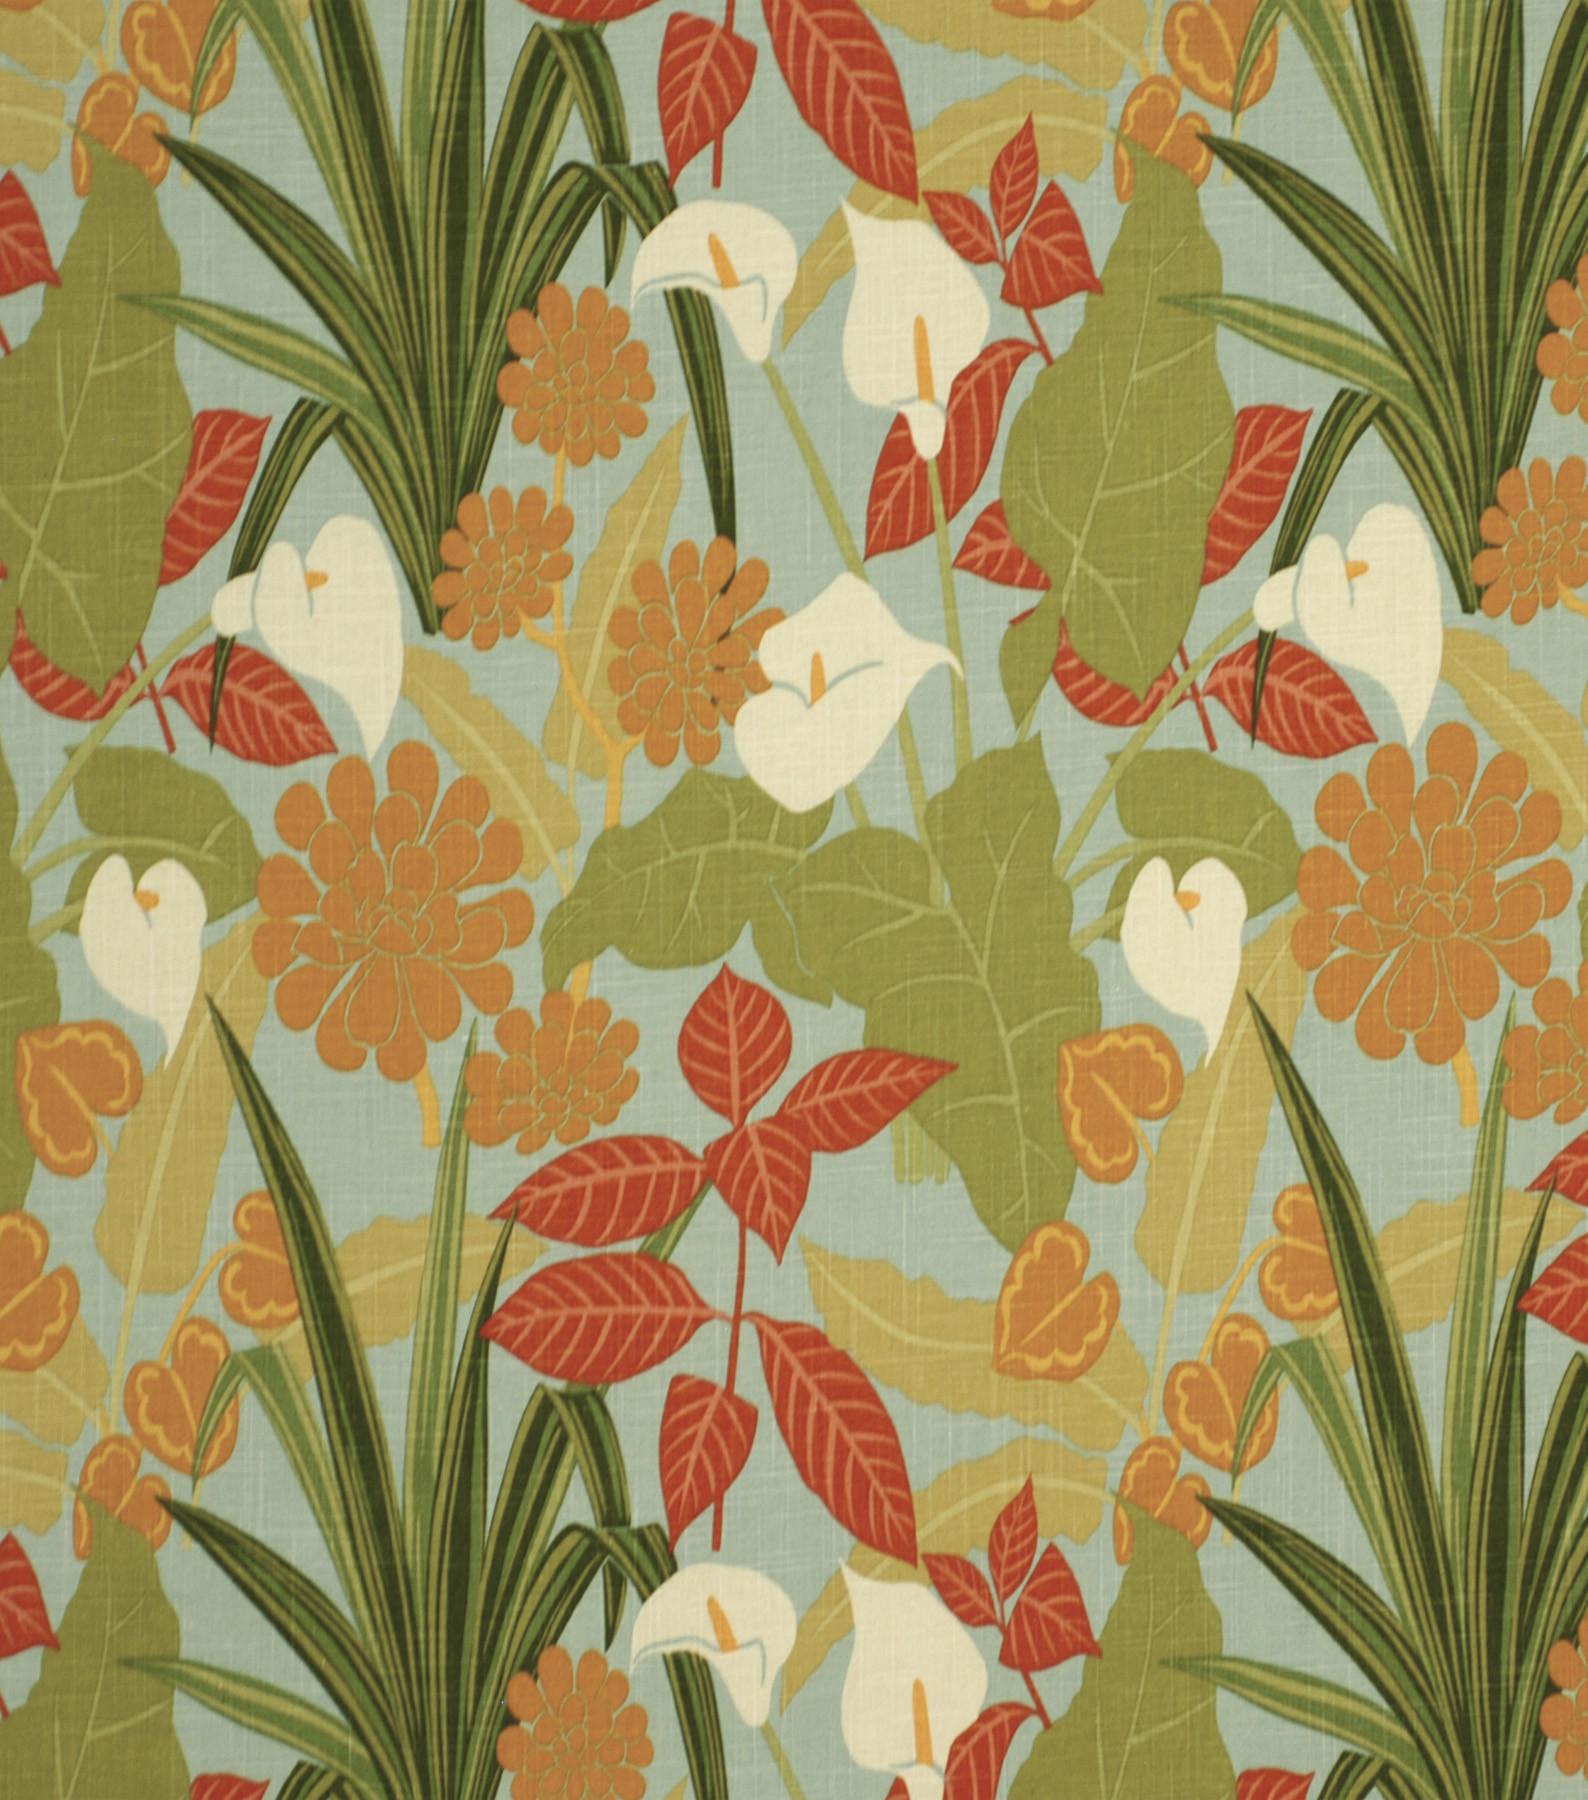 Home Decor Print Fabric-Robert Allen Rowlily Palm Beach | JOANN